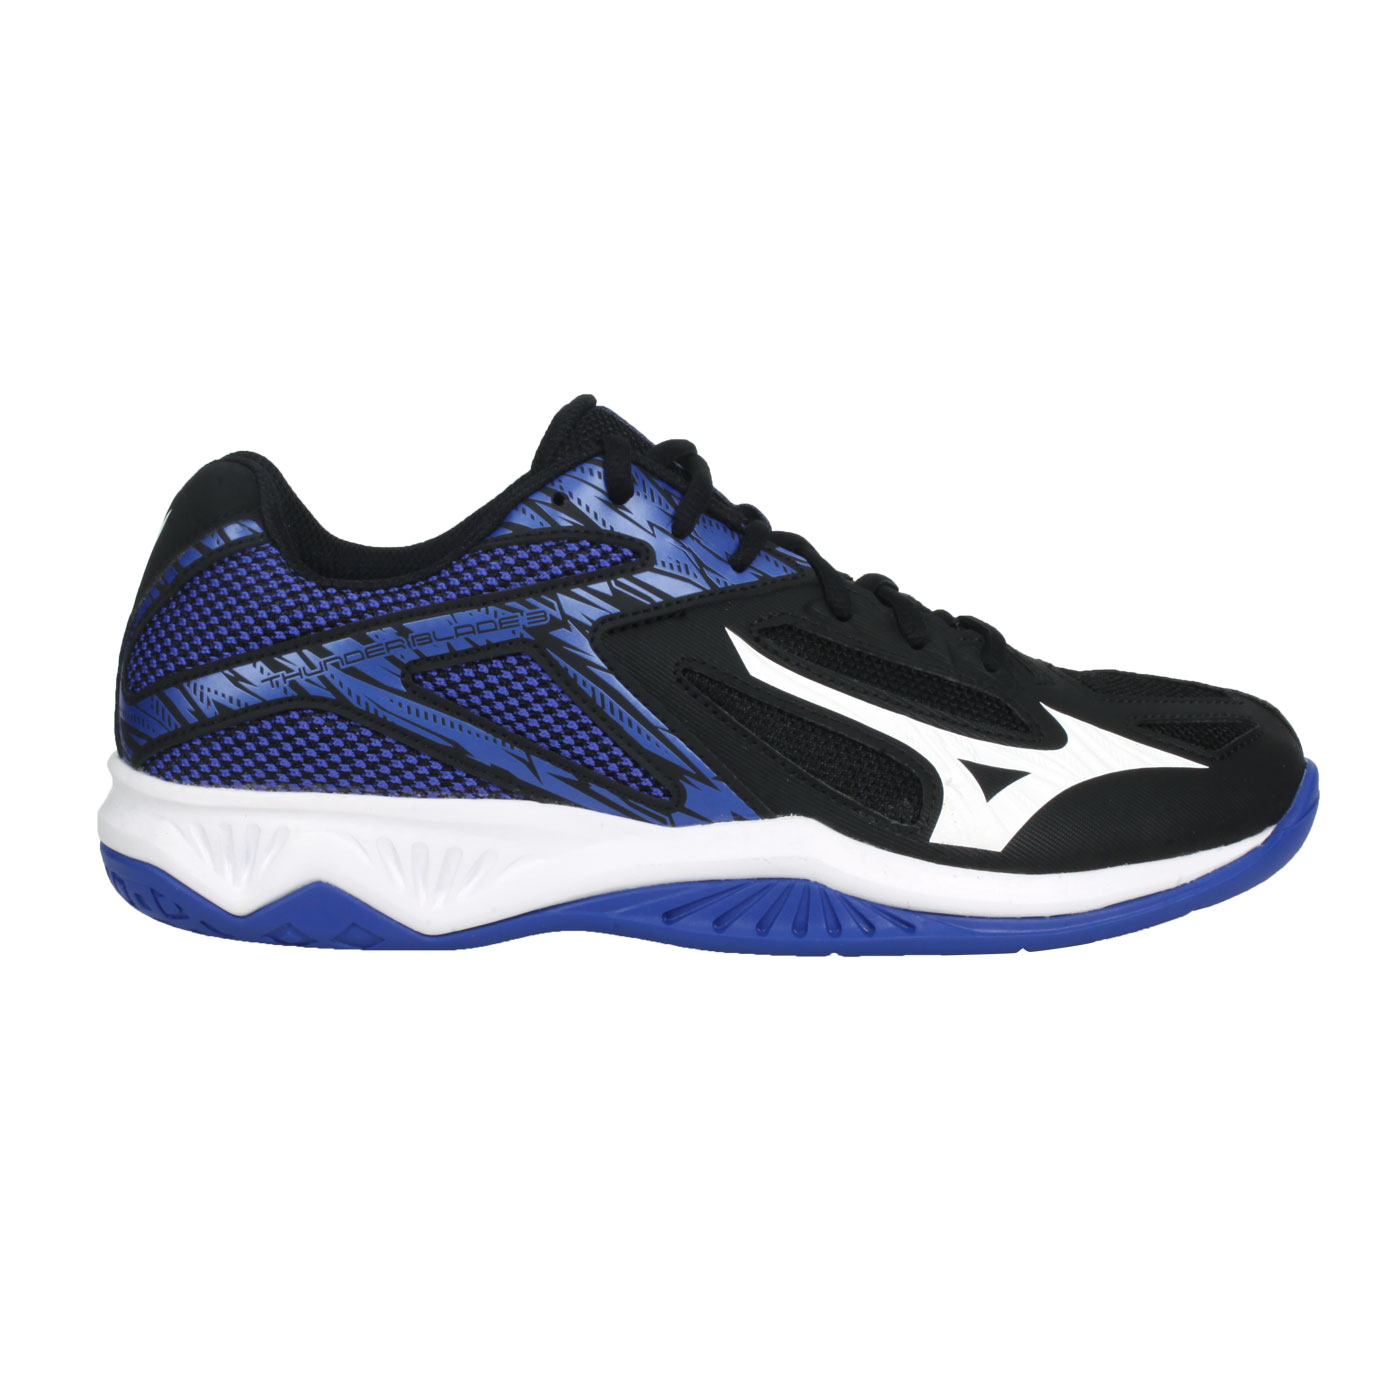 MIZUNO 排球鞋  @THUNDER BLADE 3@V1GA217003 - 黑白